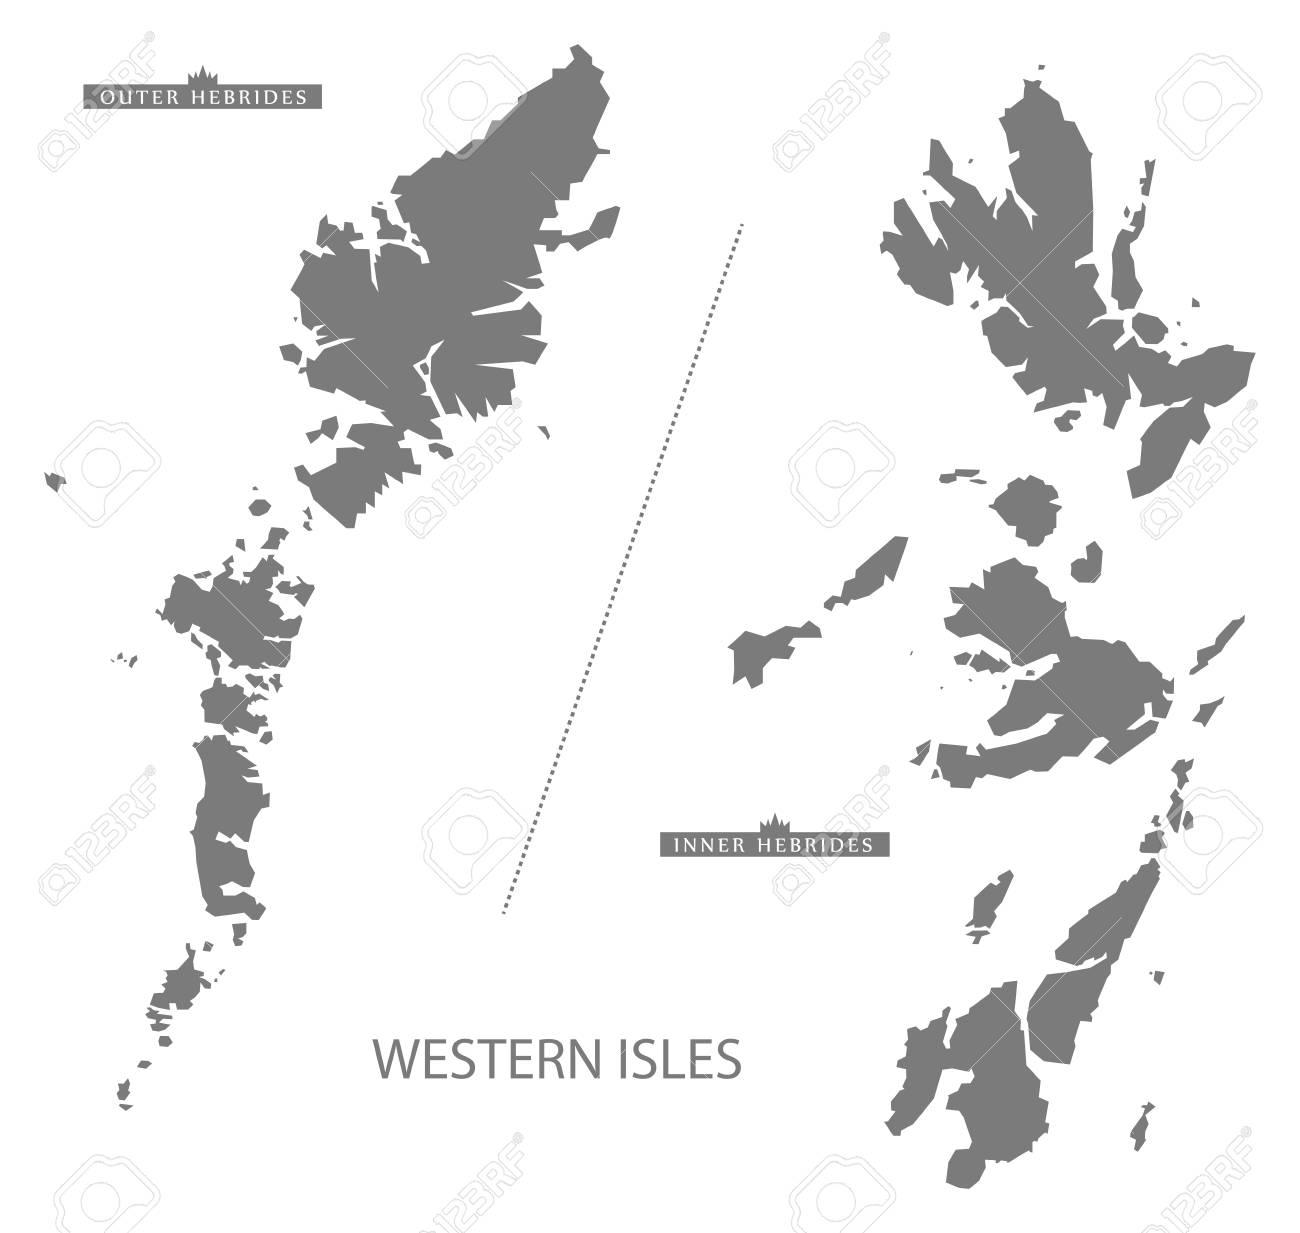 Western Isles Scotland Map in grey - 61569865